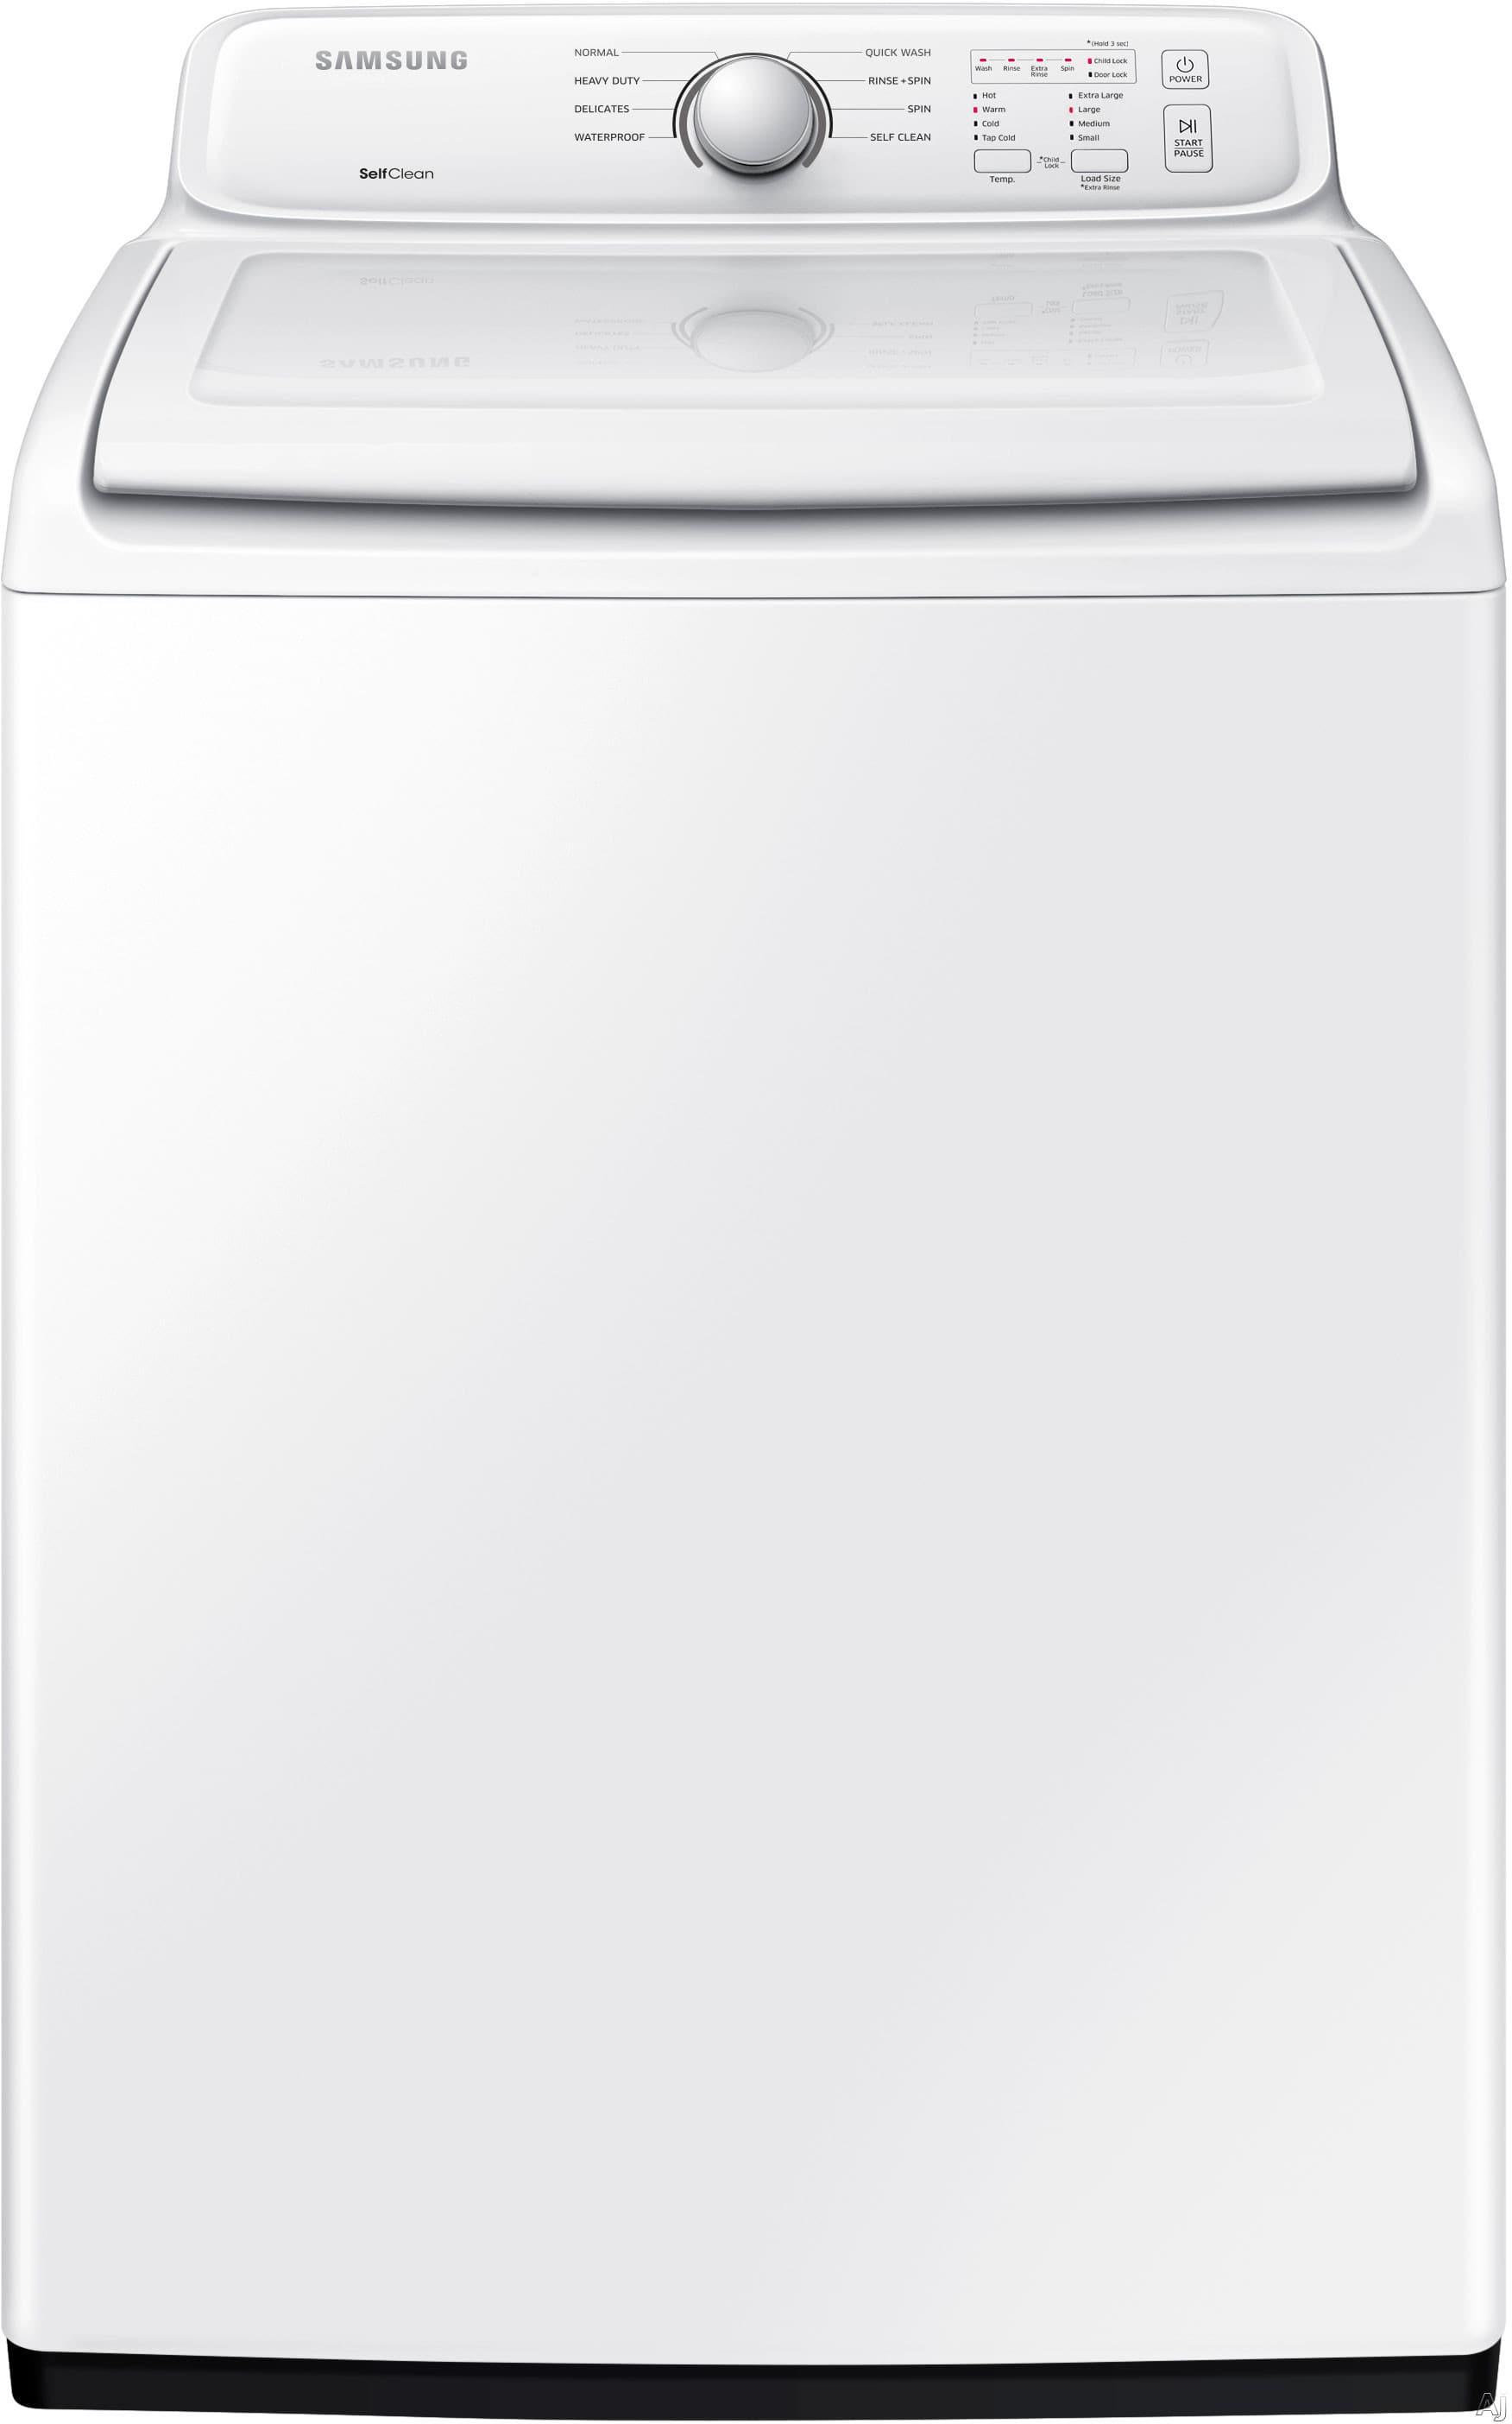 Samsung Wa40j3000aw 27 Inch 4 0 Cu Ft Top Load Washer